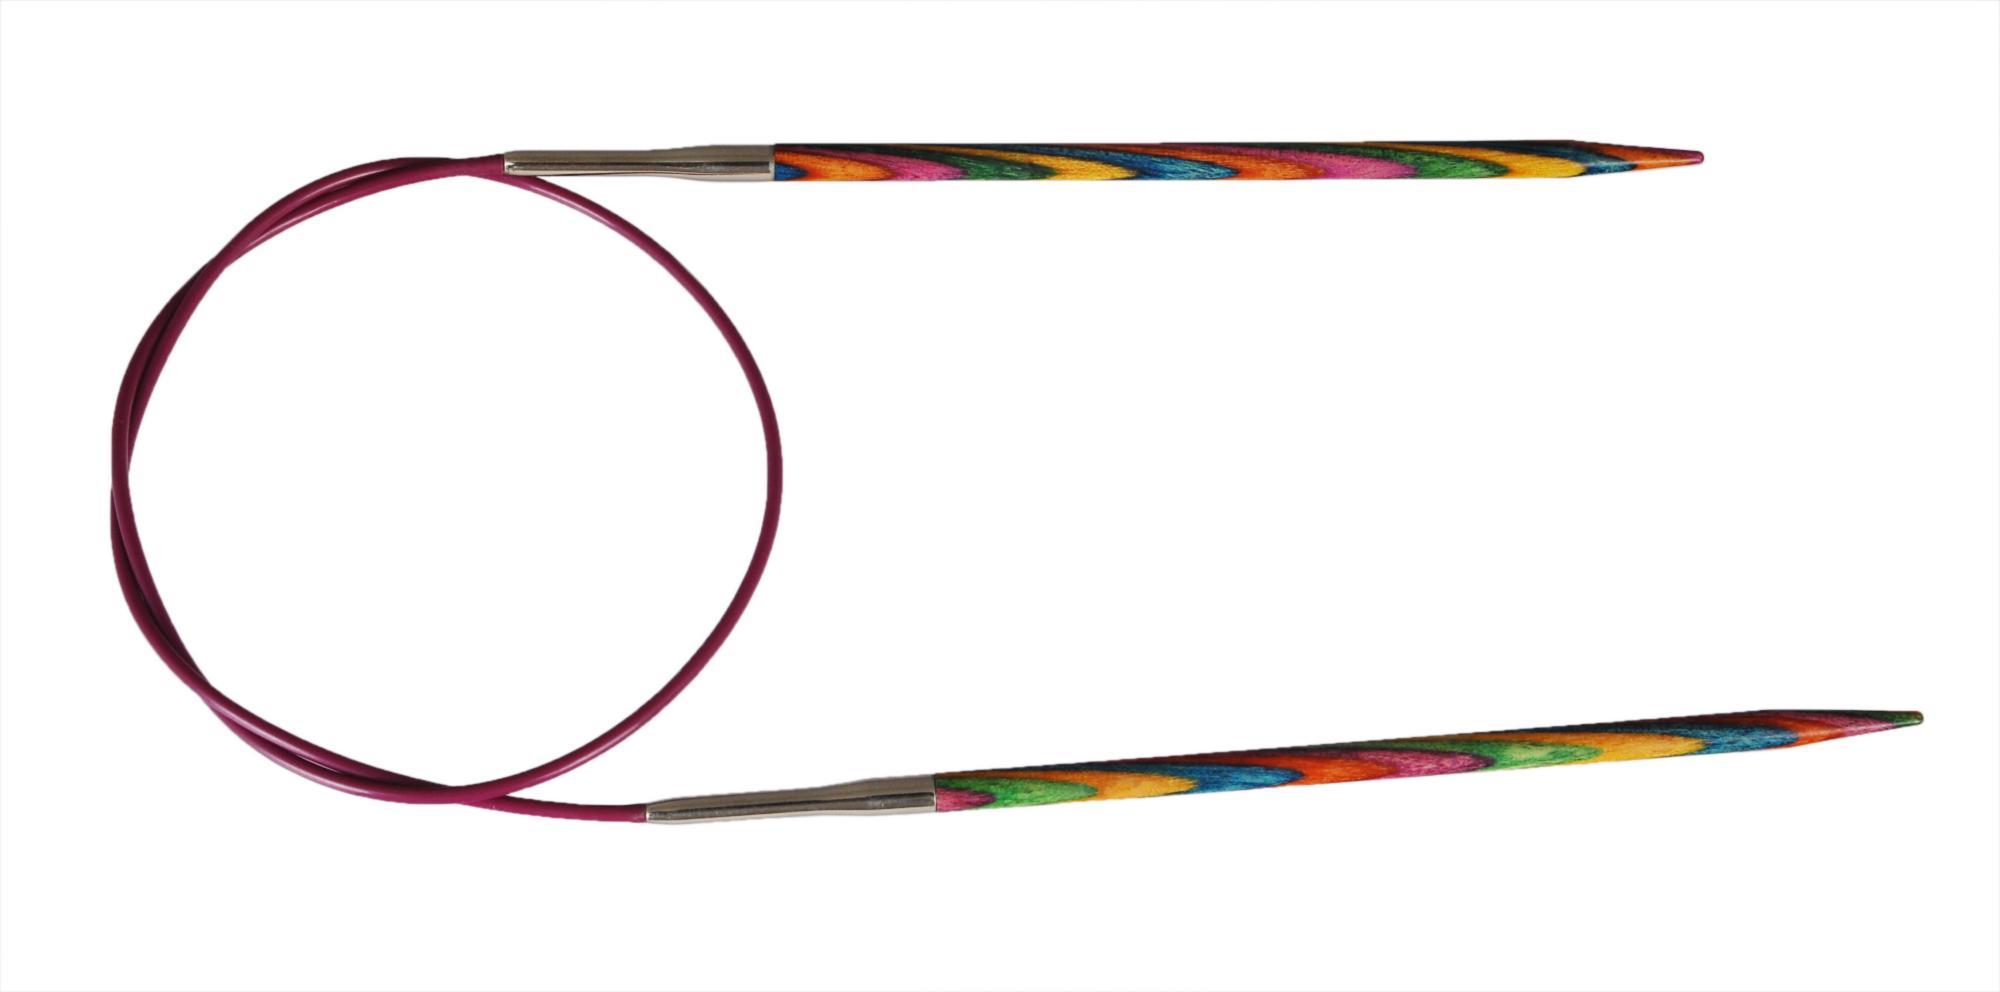 Спицы круговые 80 см Symfonie Wood KnitPro, 21346, 10.00 мм